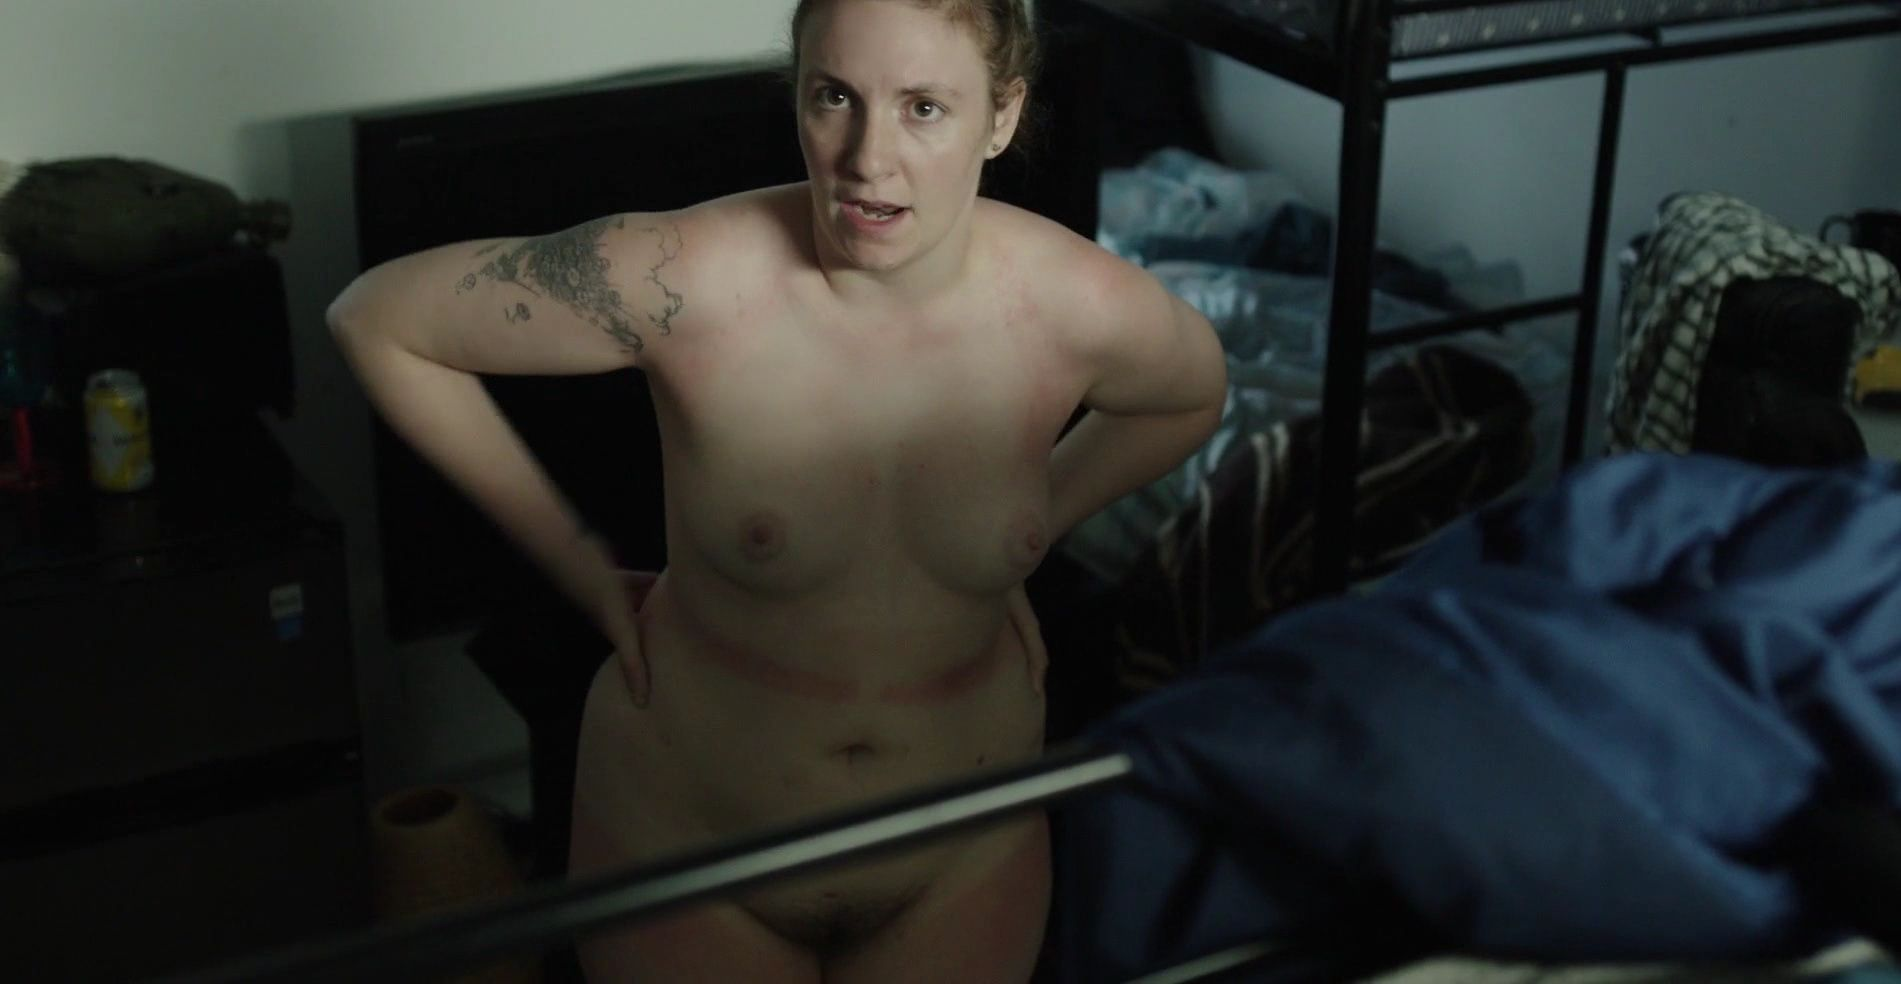 naked (33 photos), Ass Celebrites images